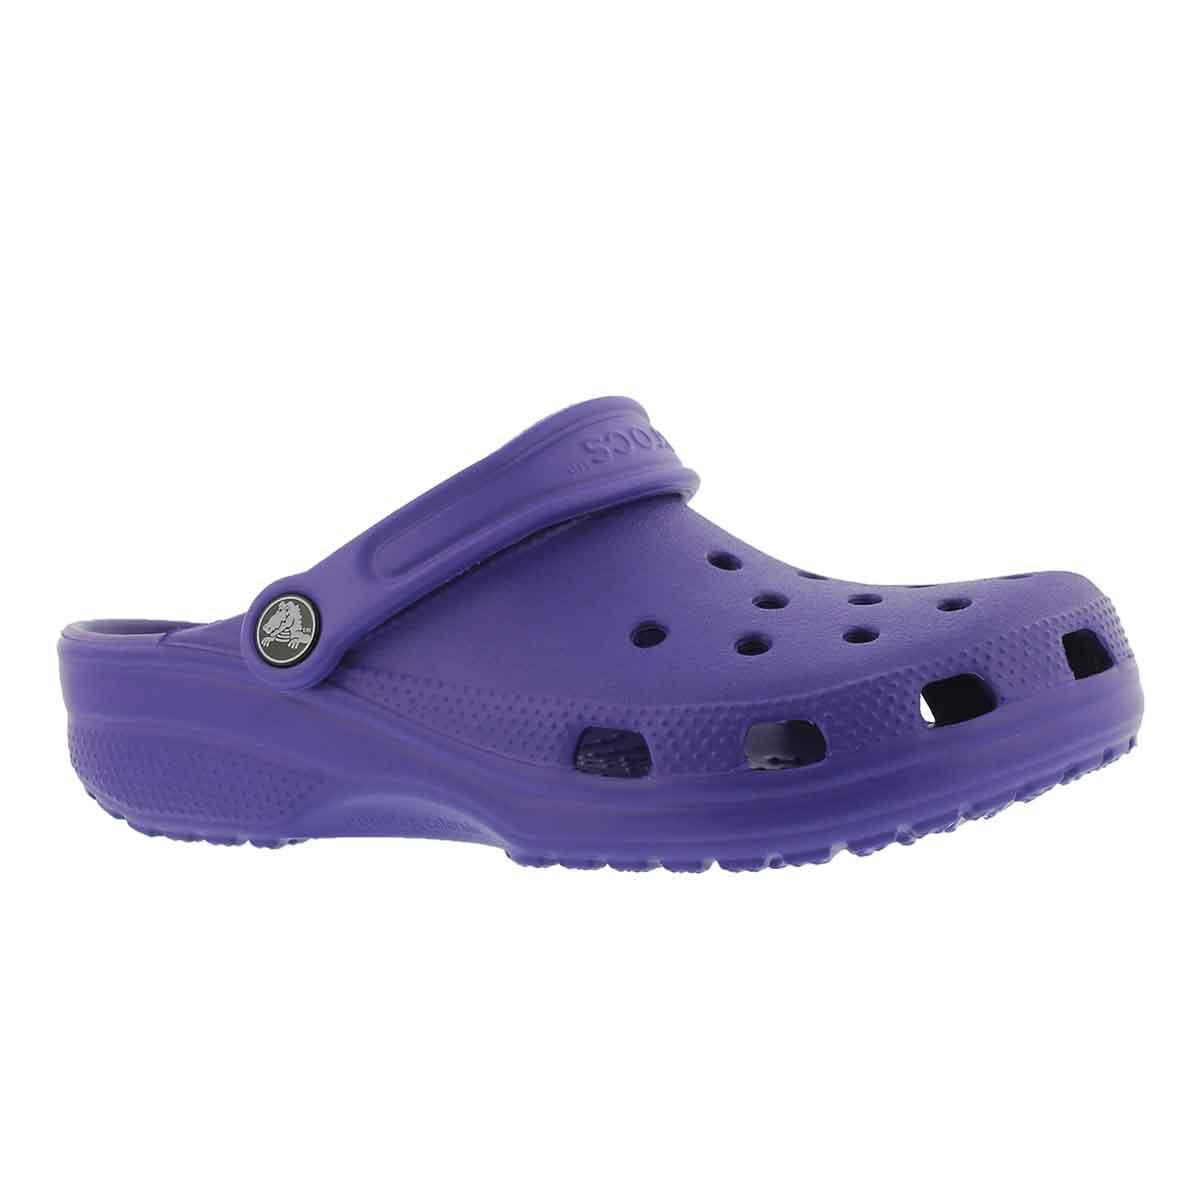 Women's CLASSIC ultraviolet EVA comfort clogs